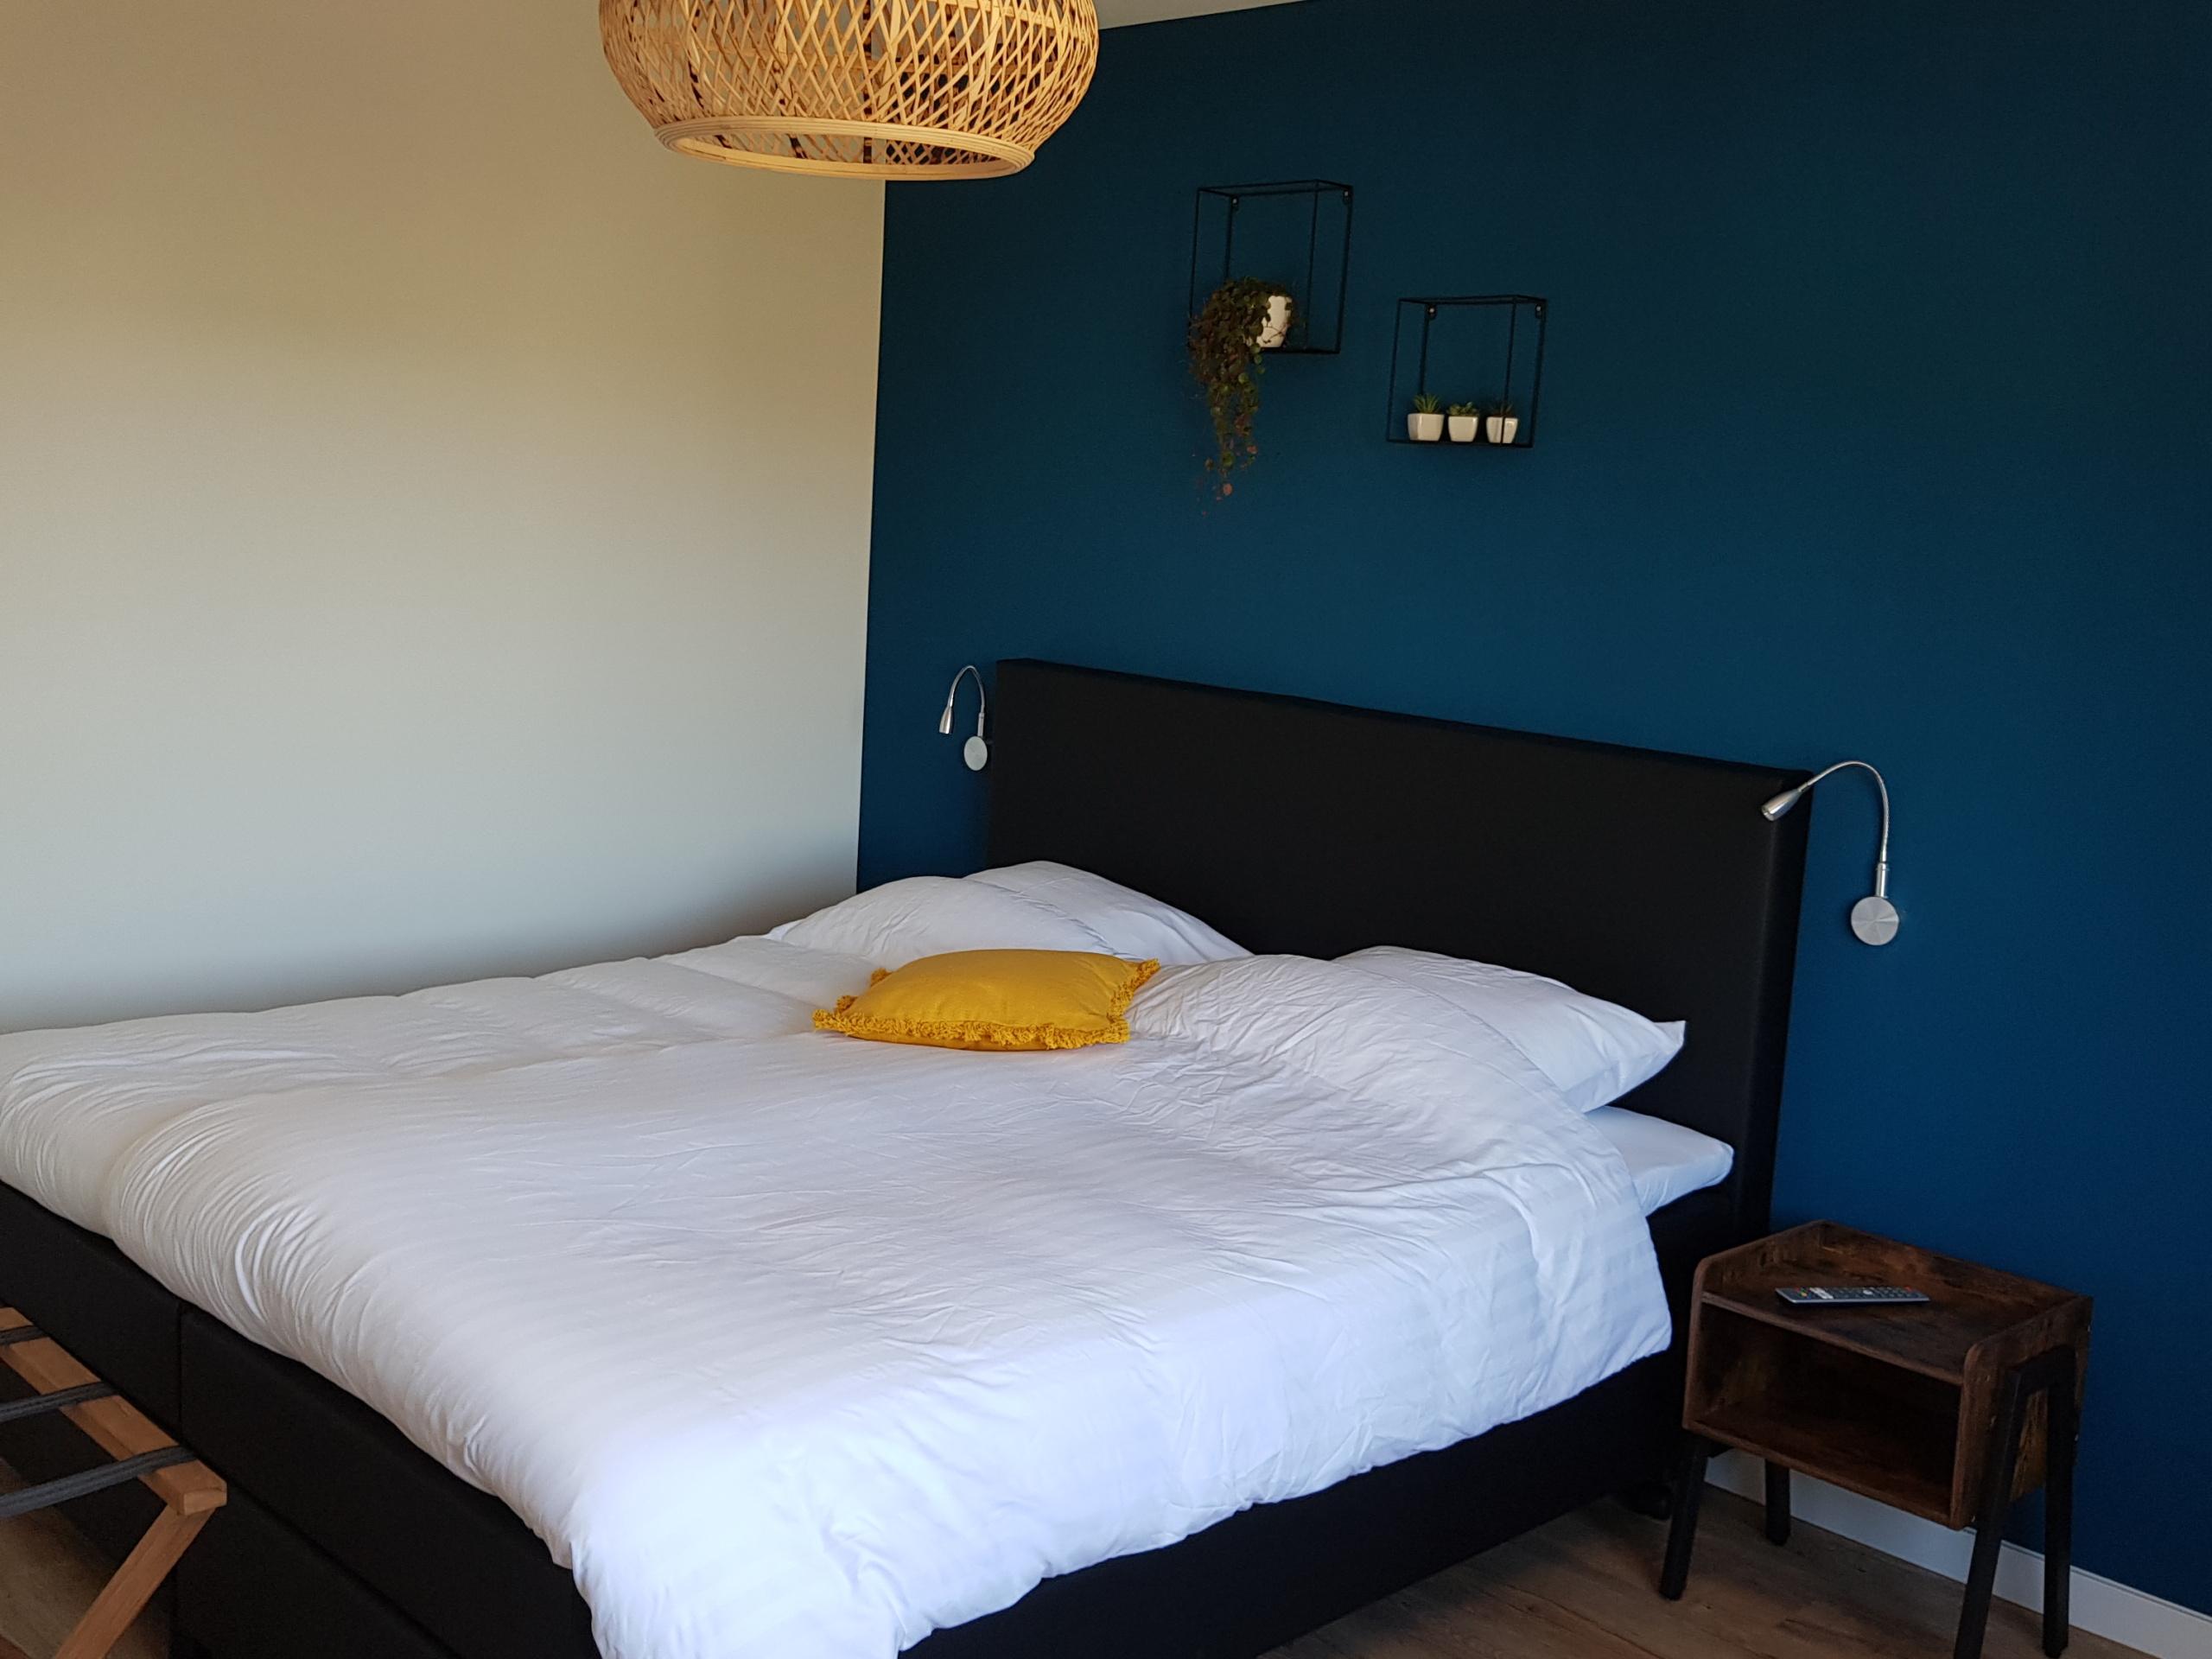 Comfortable room in attractive B&B in De Koog, within walking distance of the center